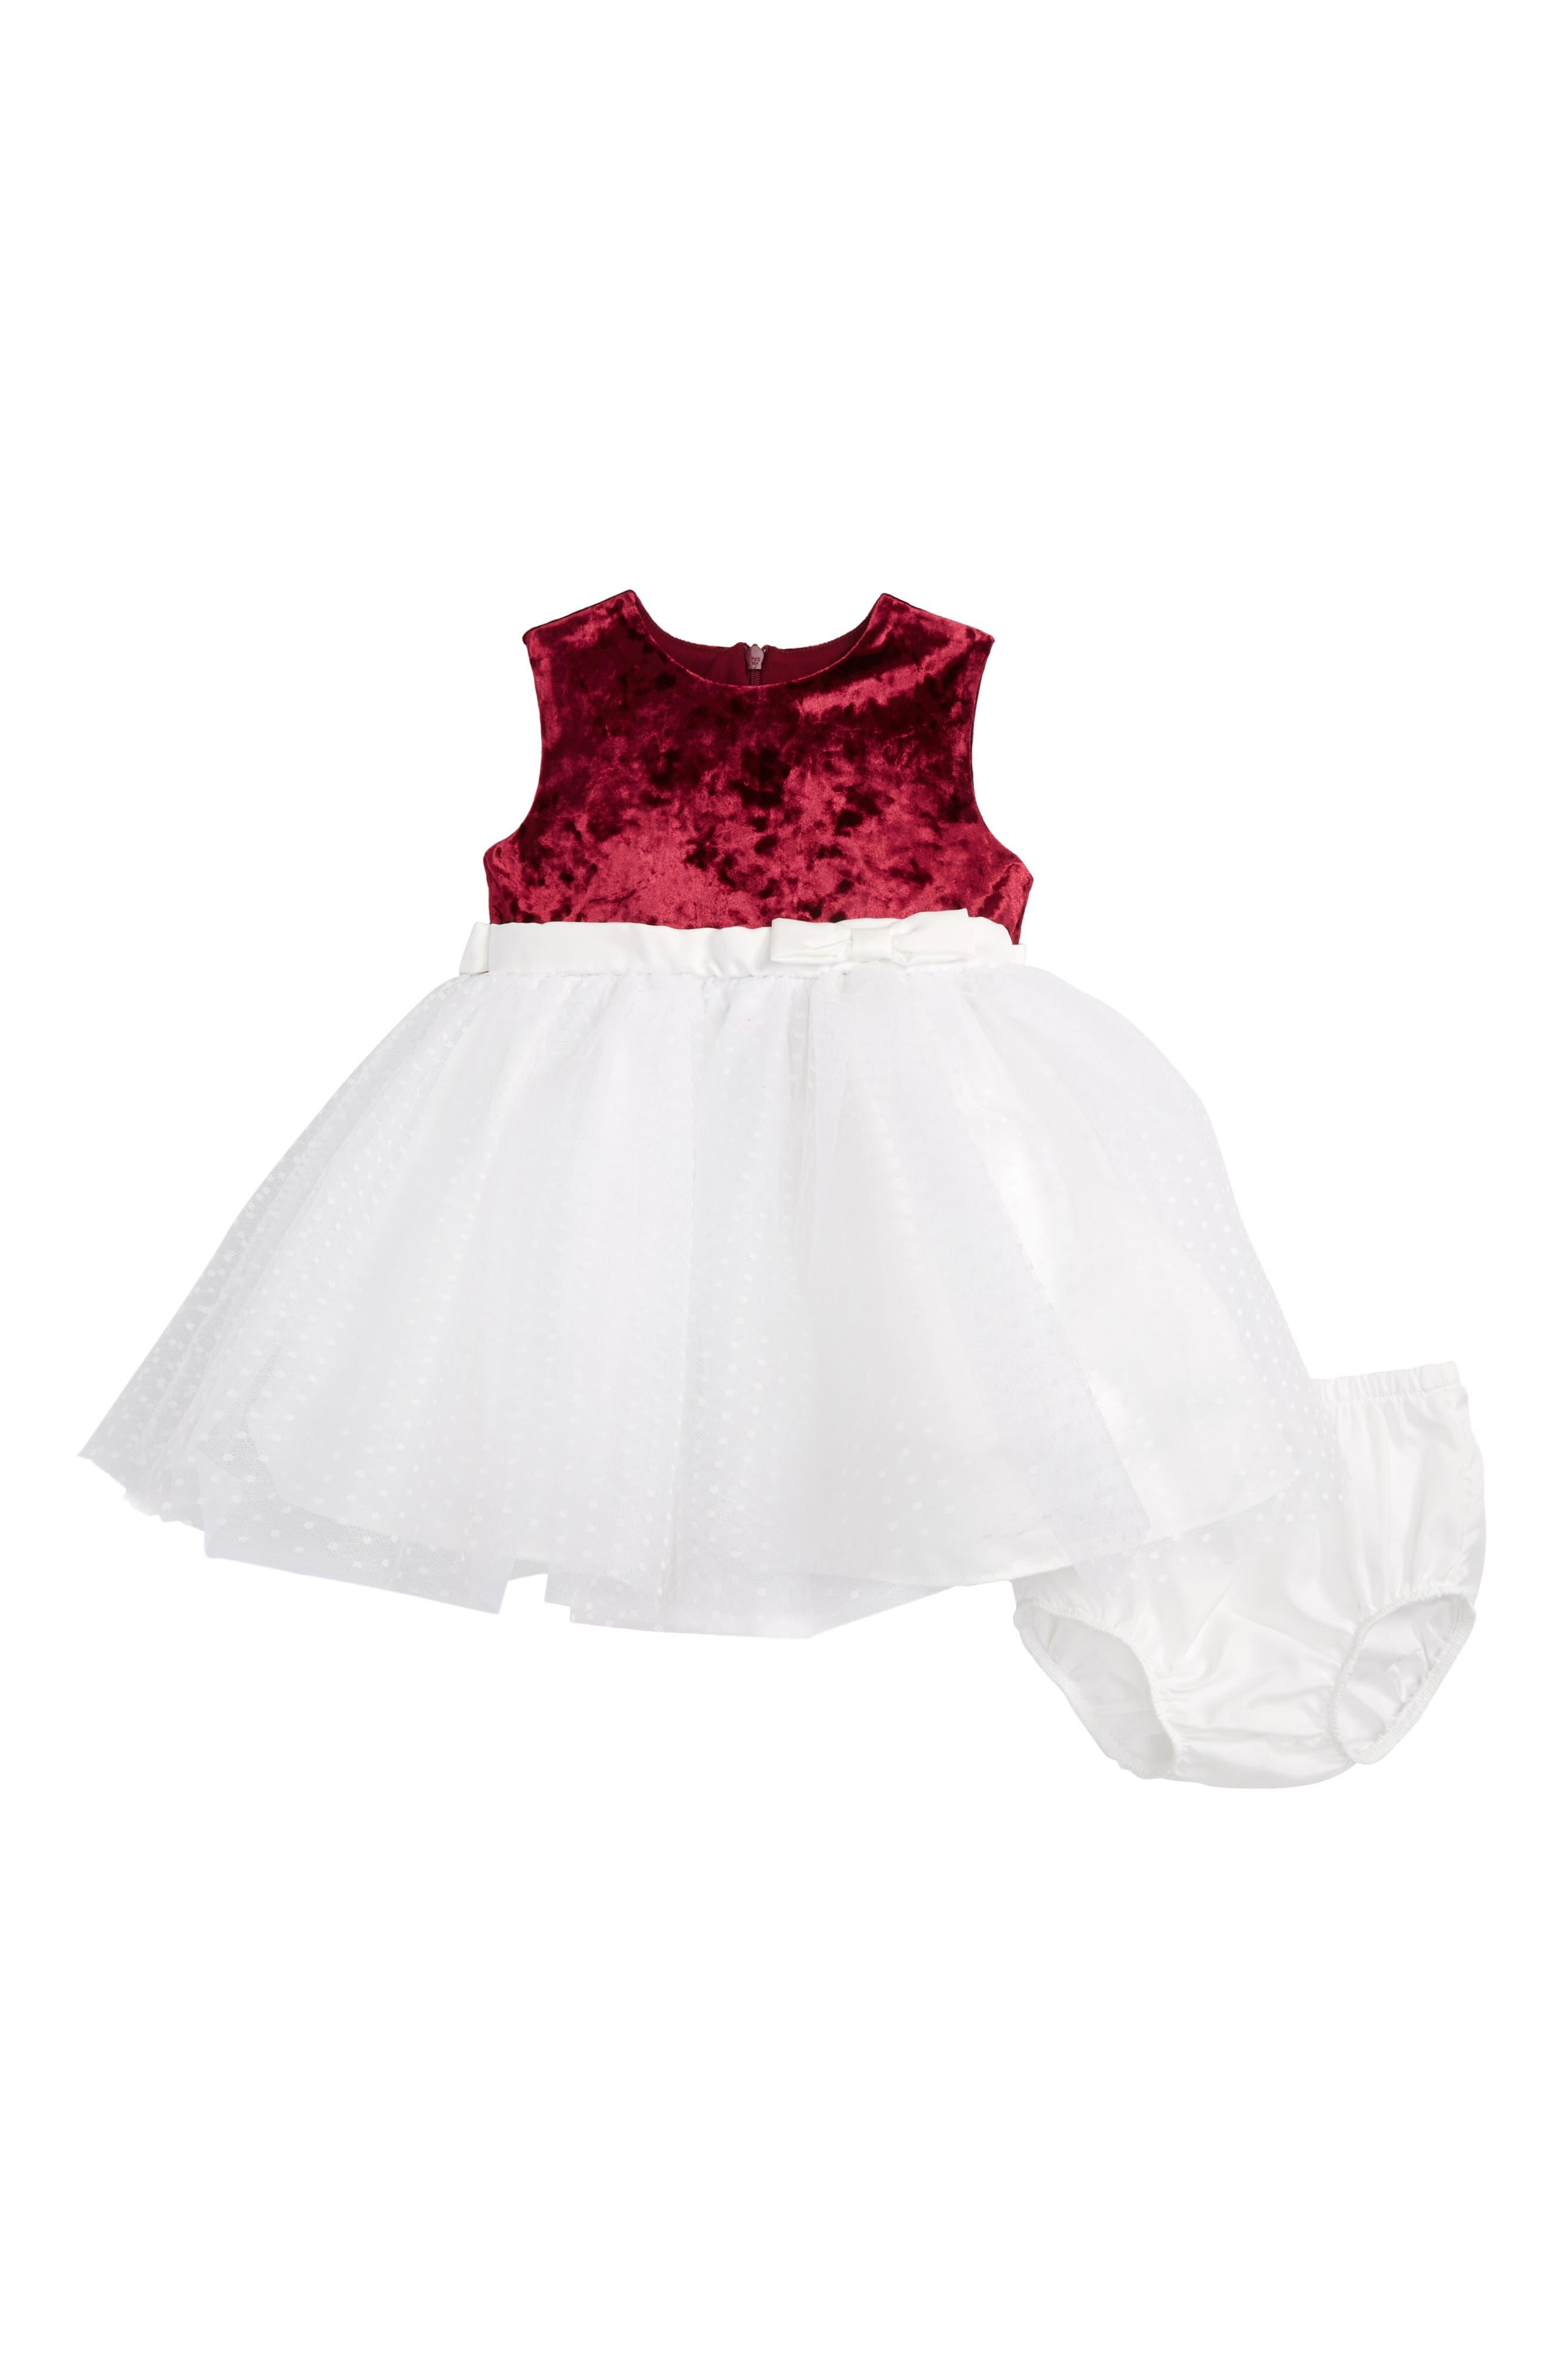 Velvet & Tulle Dress,                             Main thumbnail 1, color,                             Cranberry